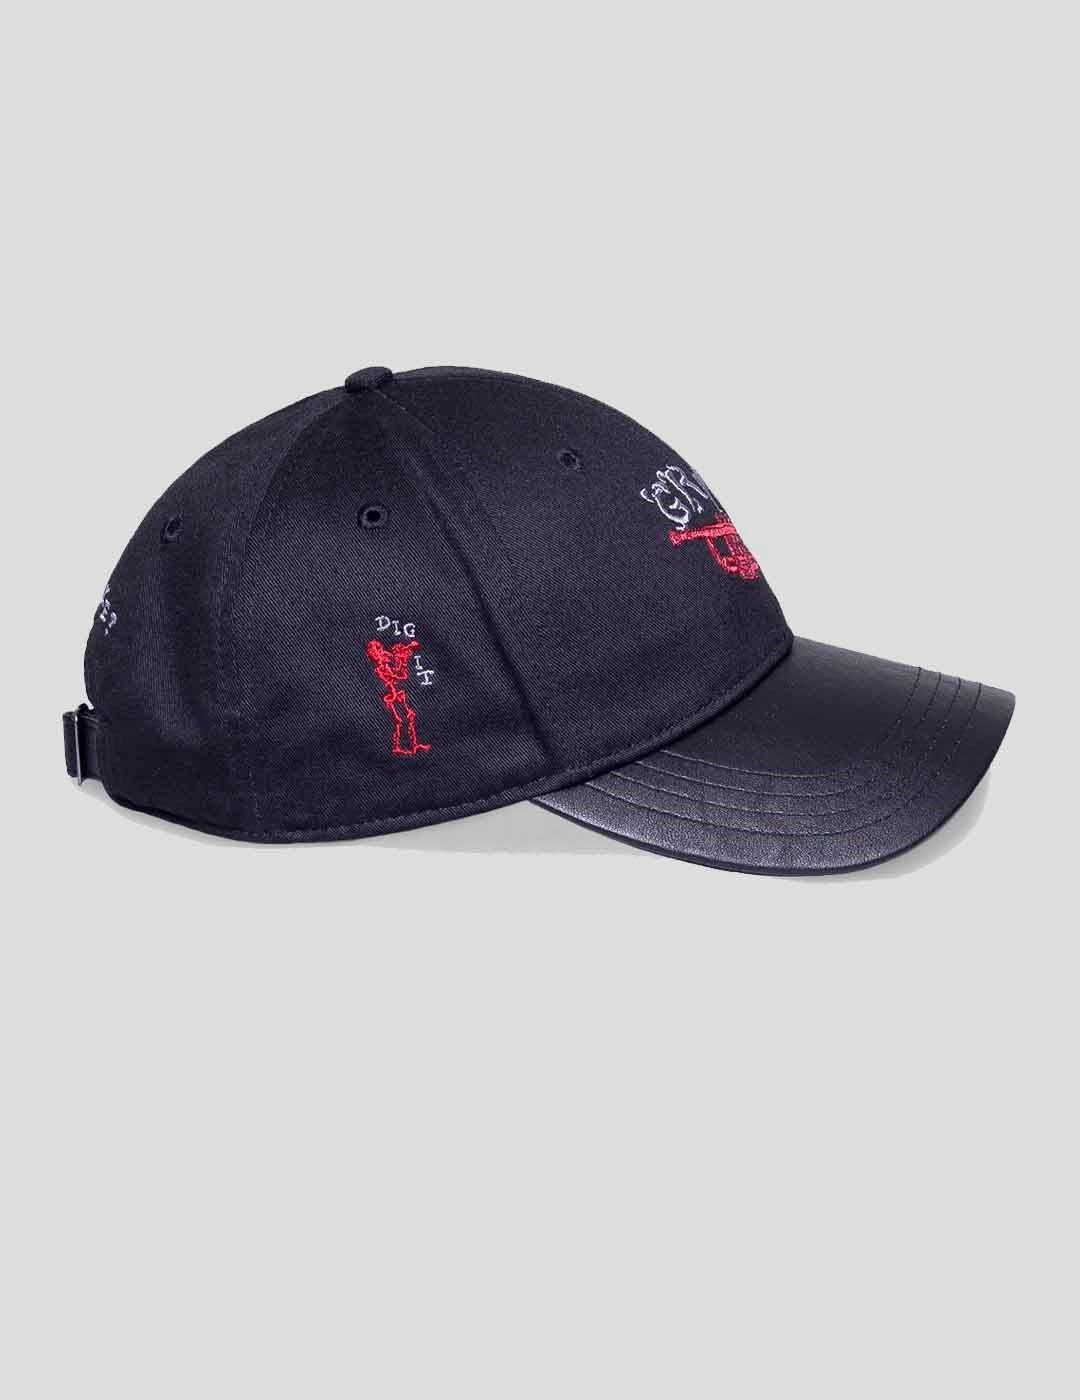 GORRA GRIMEY JAZZ THING CURVED VISOR CAP BLACK